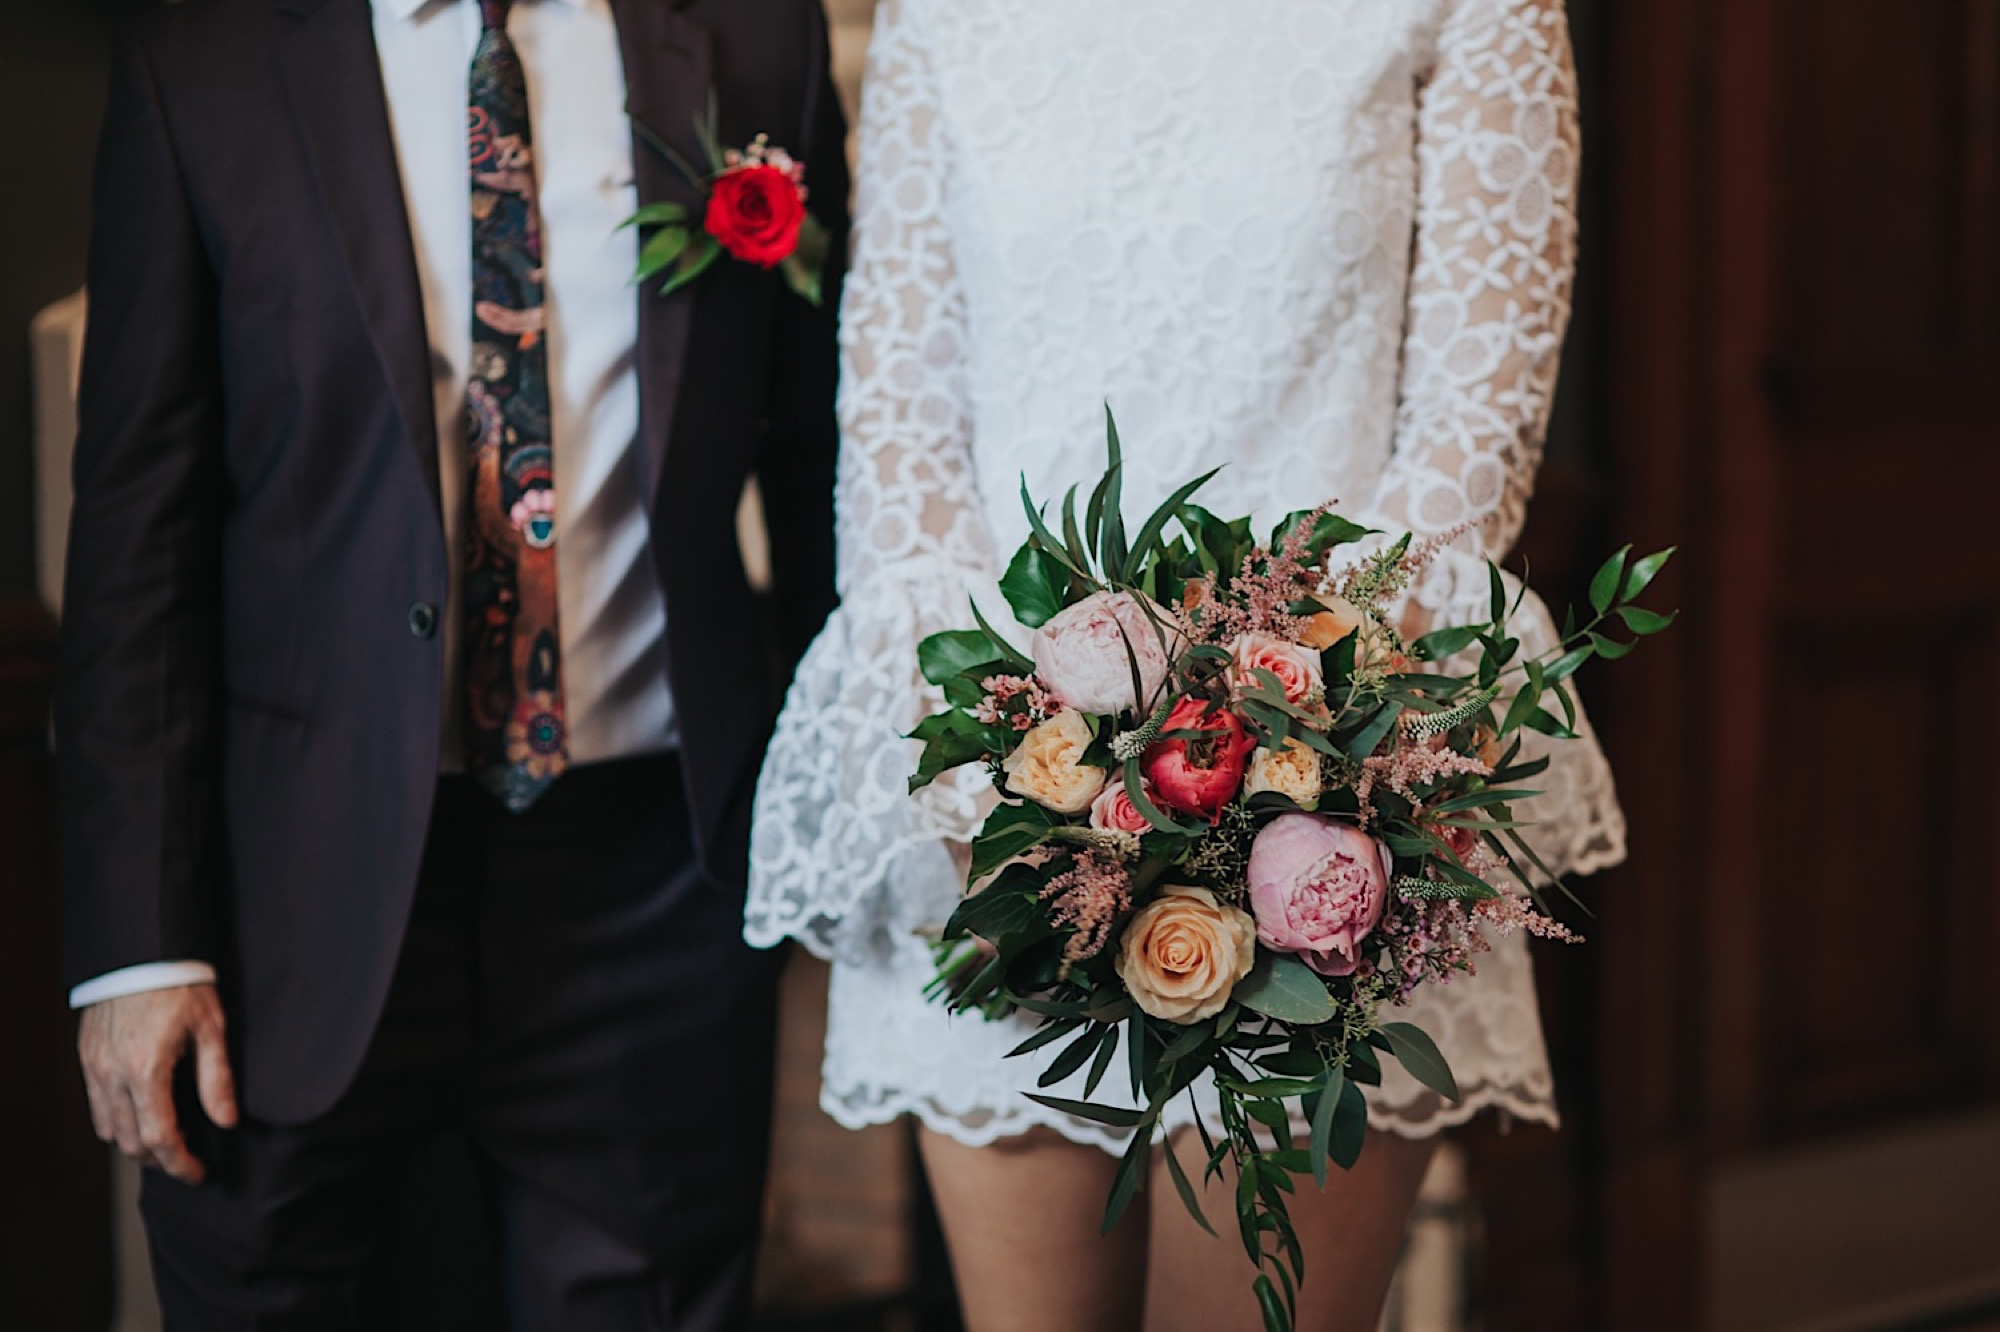 montrose registry office wedding